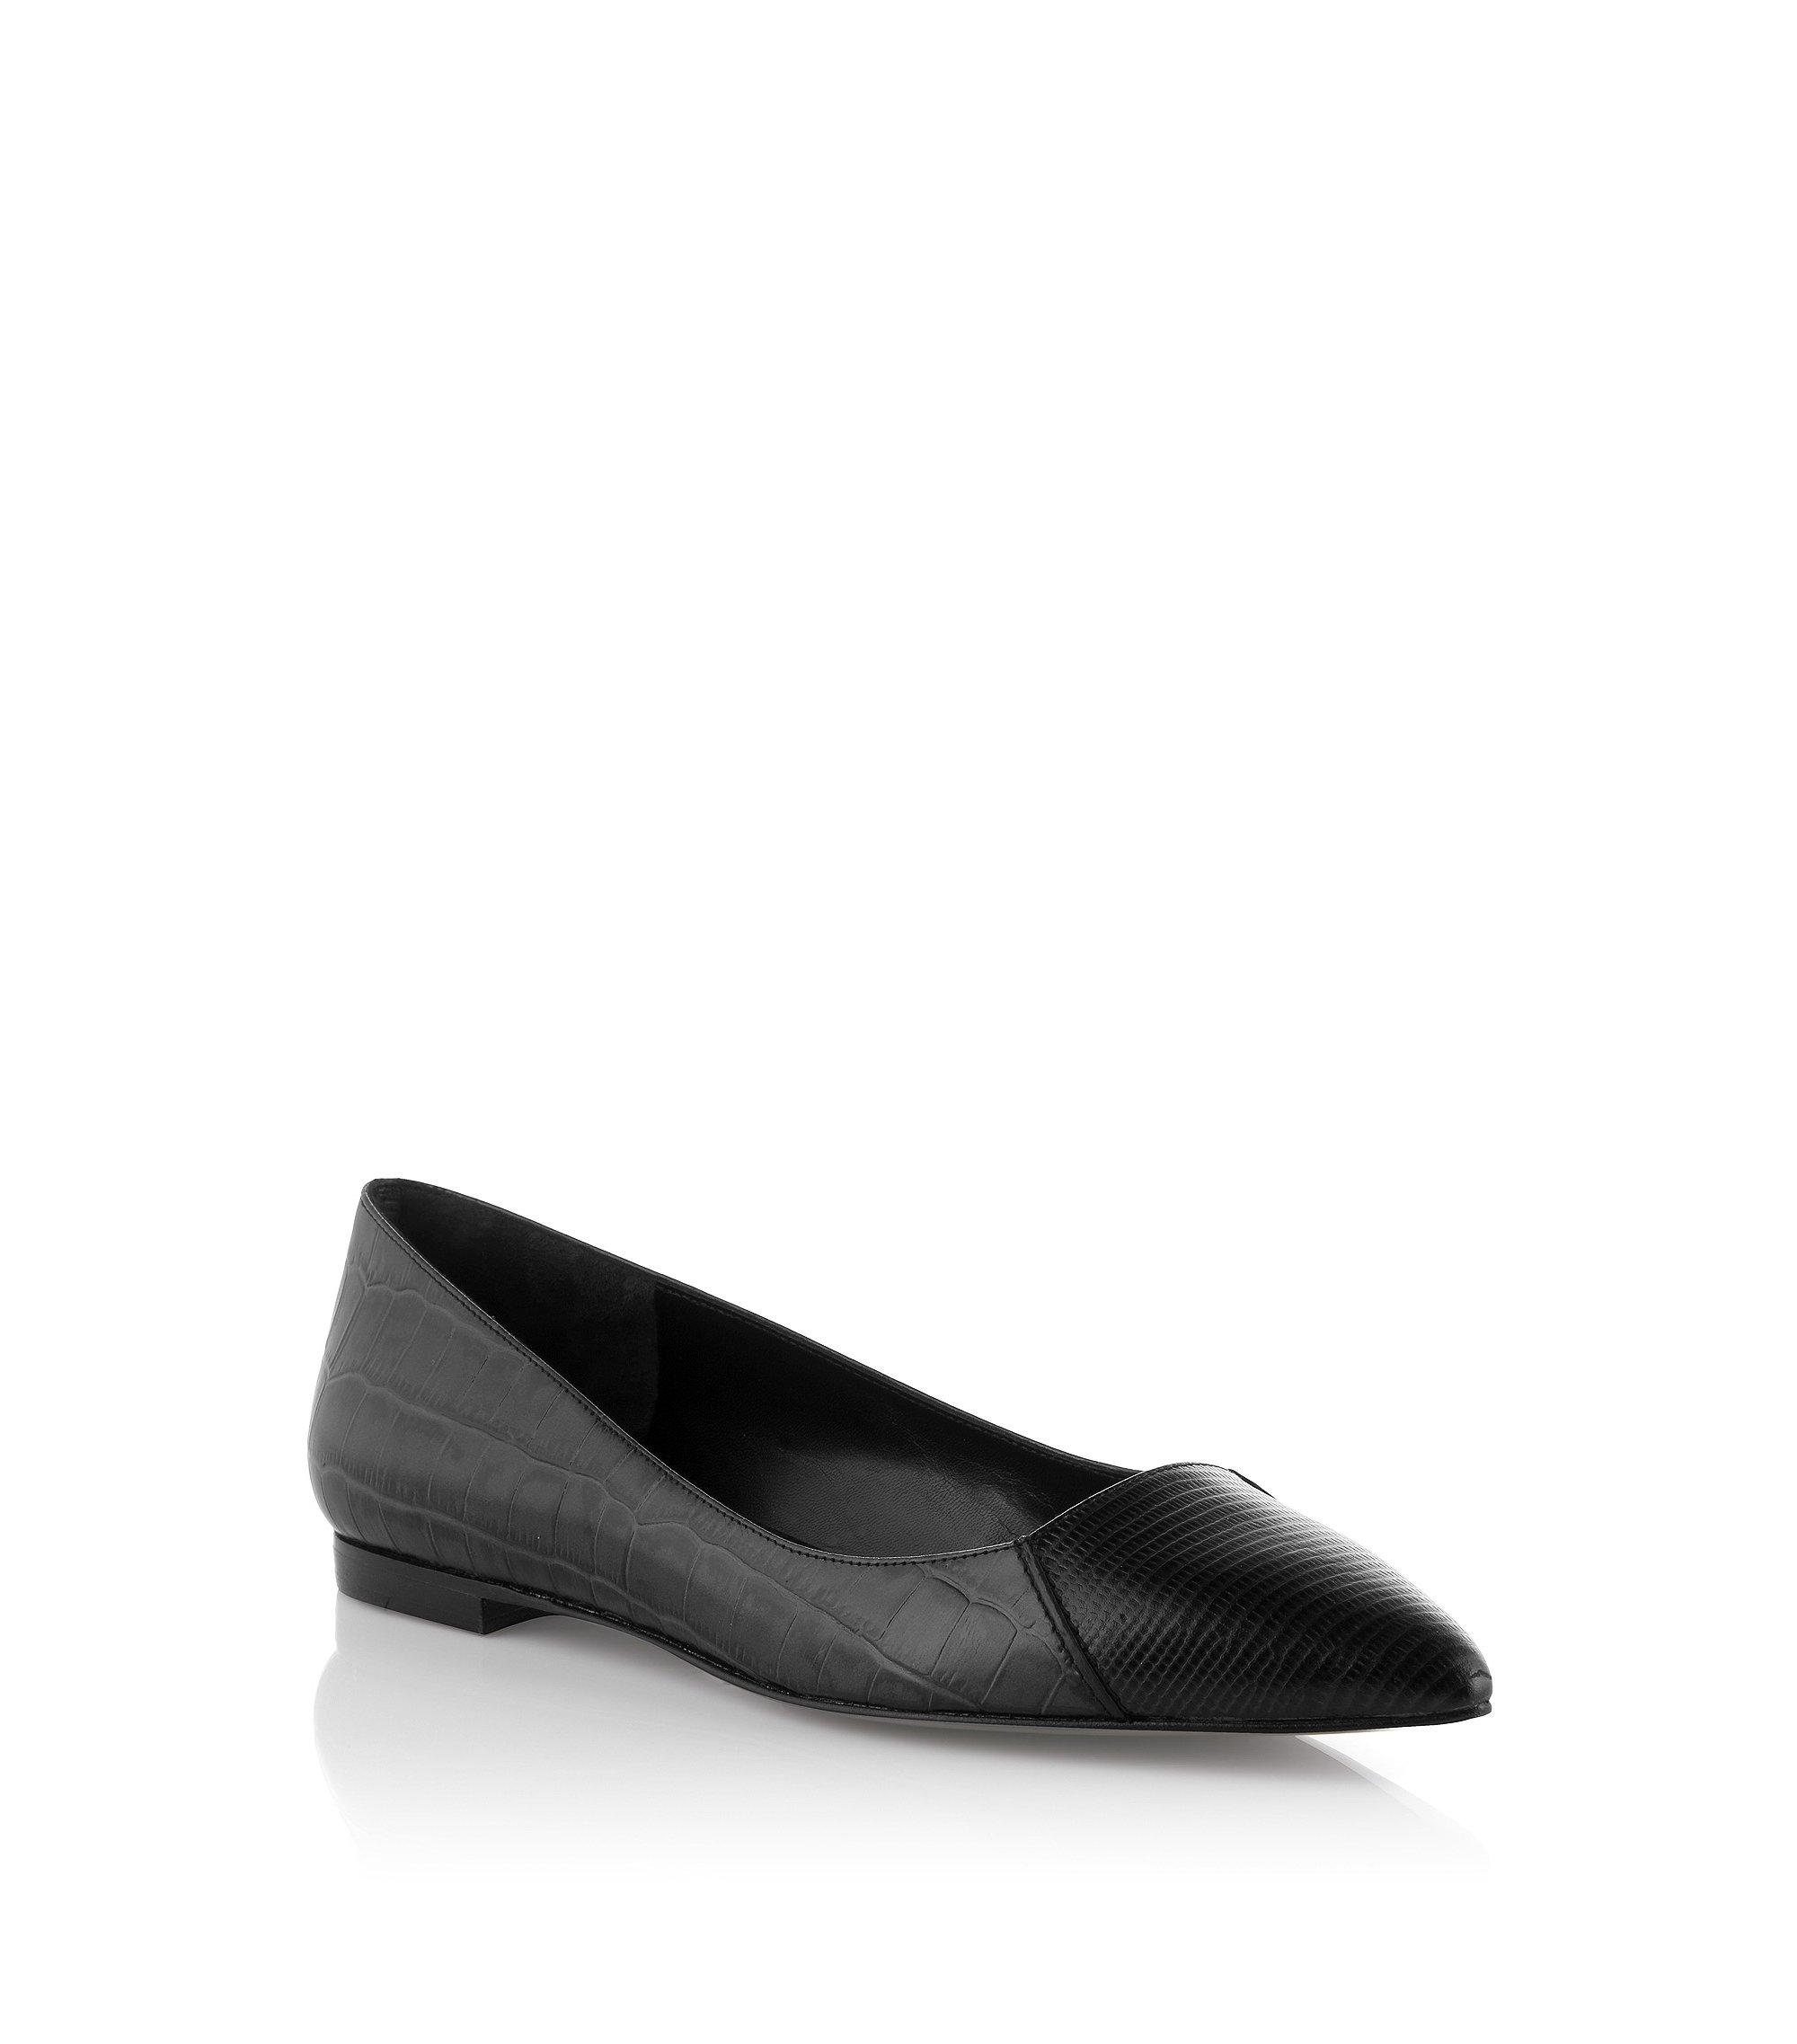 Crocodile embossed leather ballerina 'Crela', Black